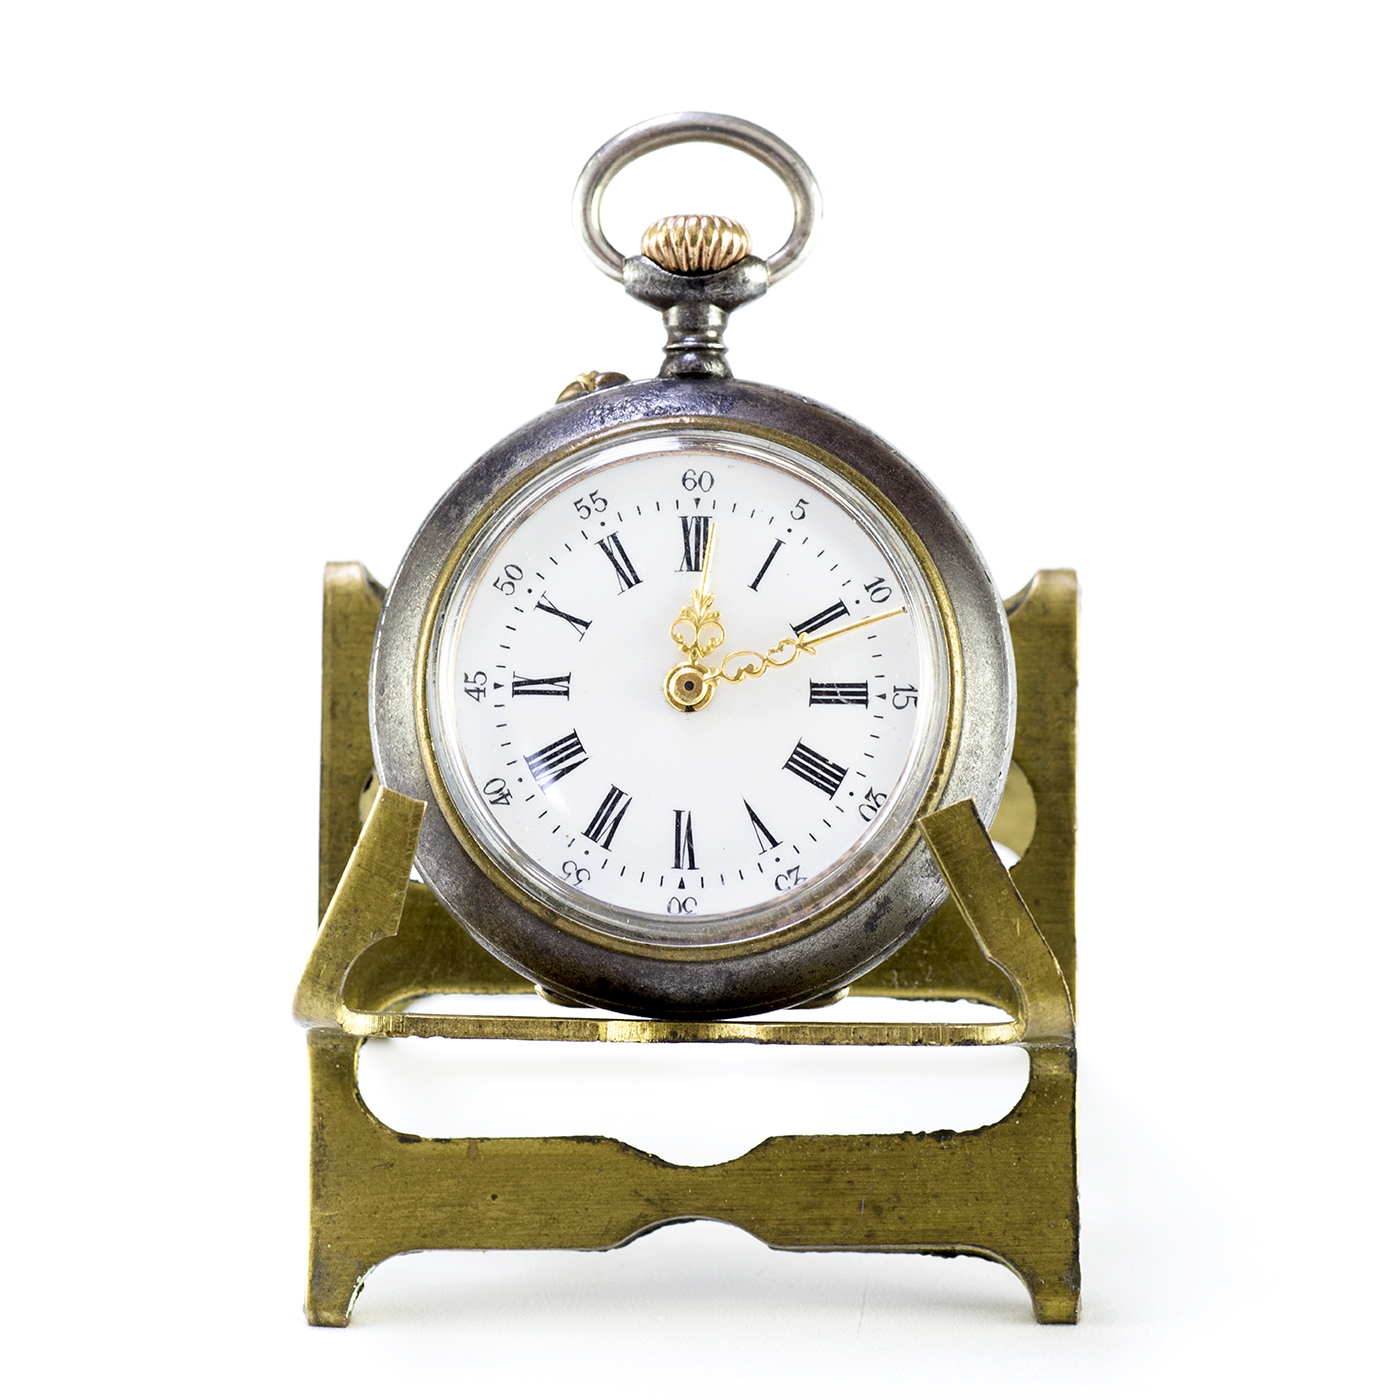 ETERNA. Schild Fréres & Co. (PROT) Reloj de colgar, lepine y remontoir. Suiza, ca. 1900